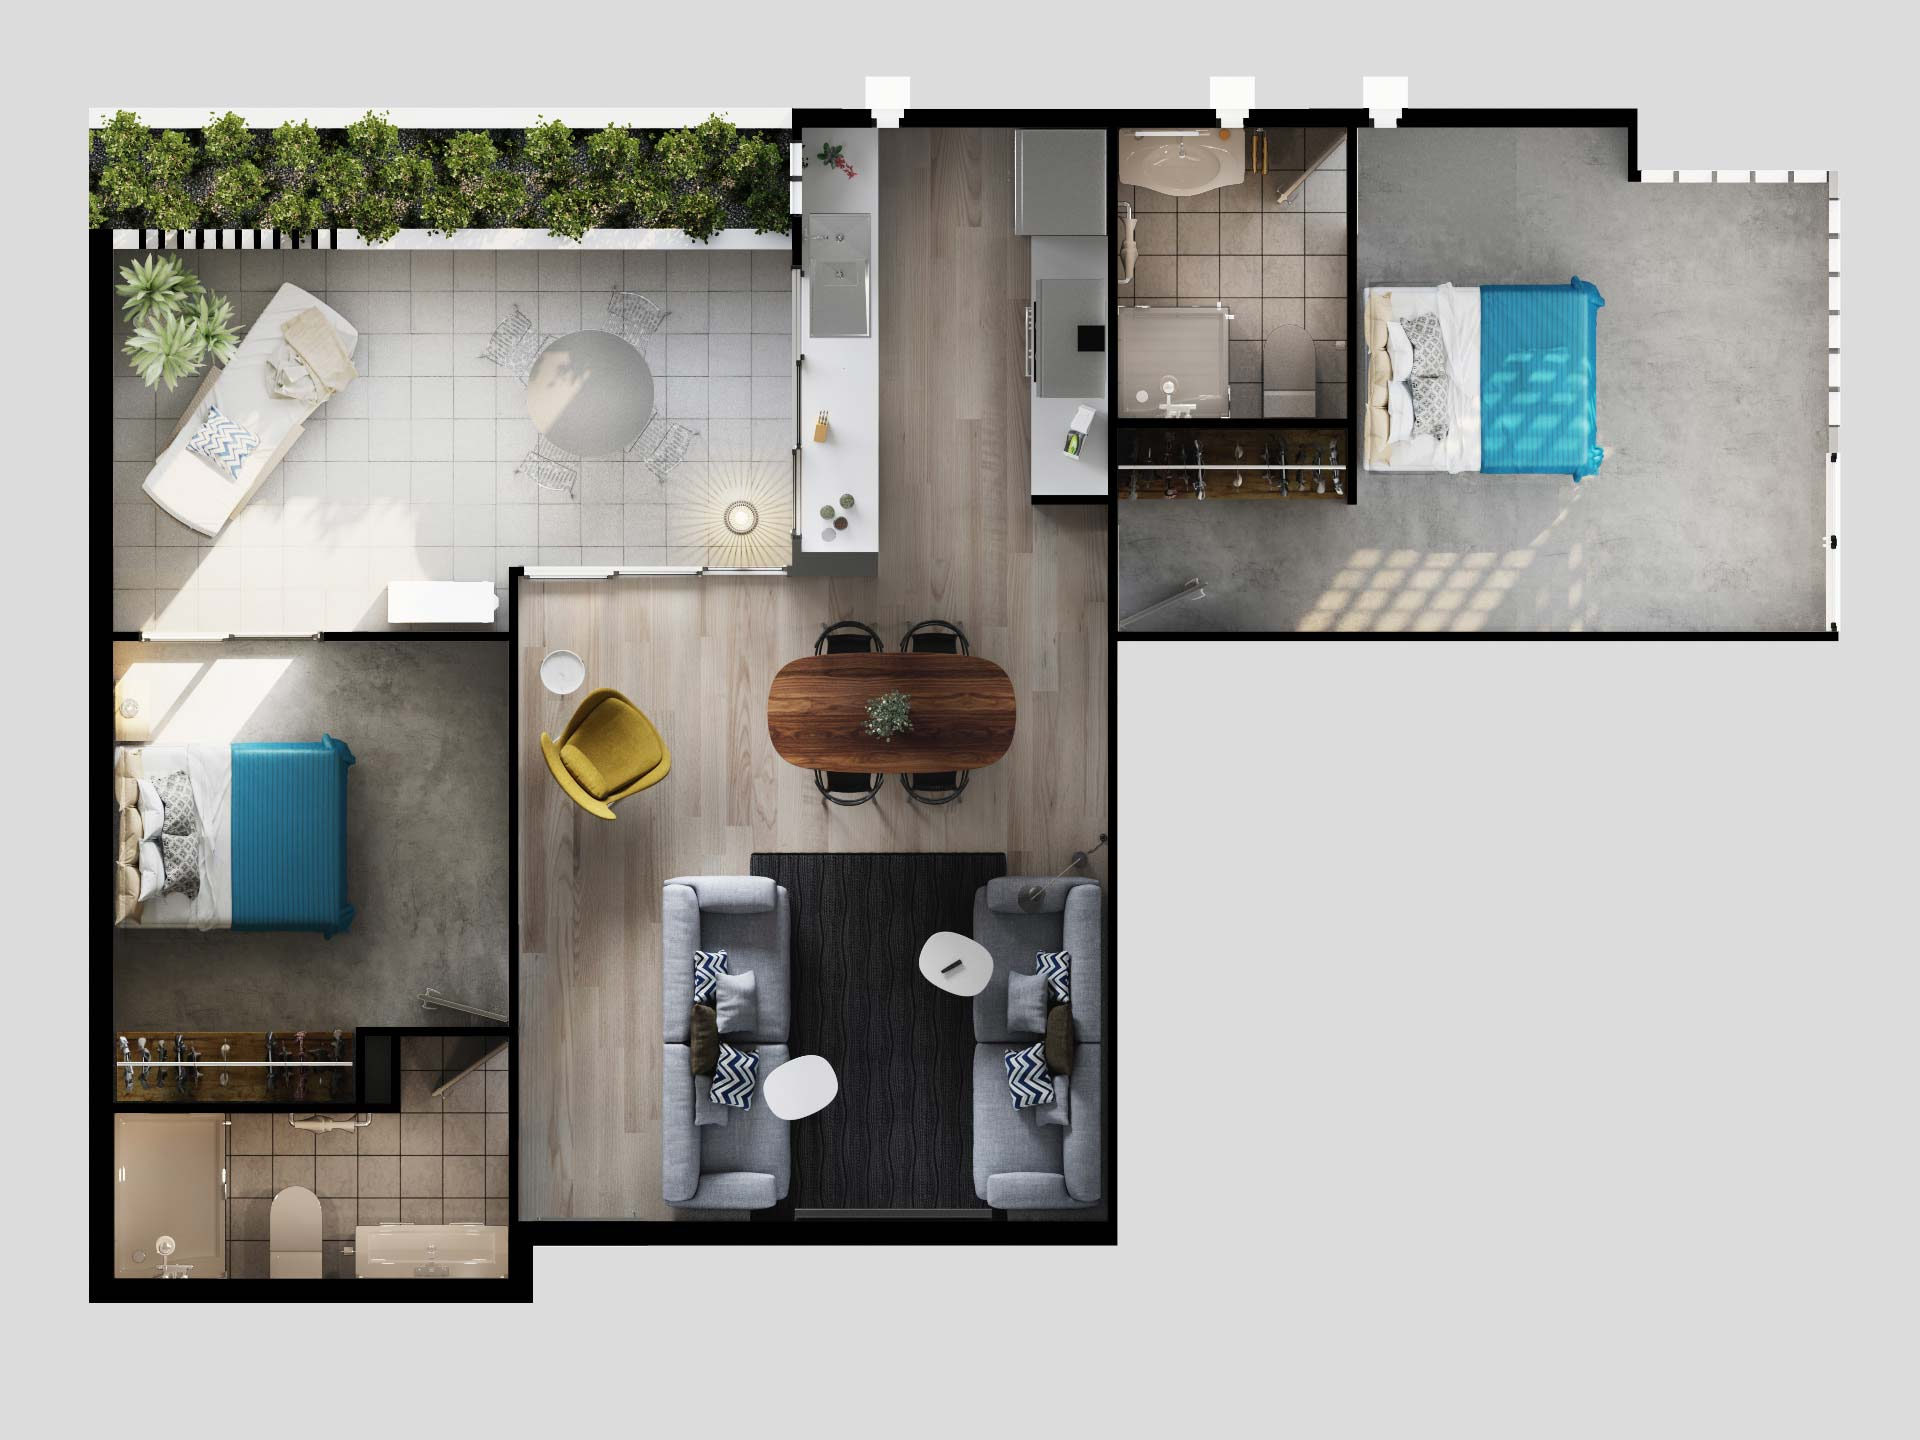 Specto3d 3d Architectural Visualisation